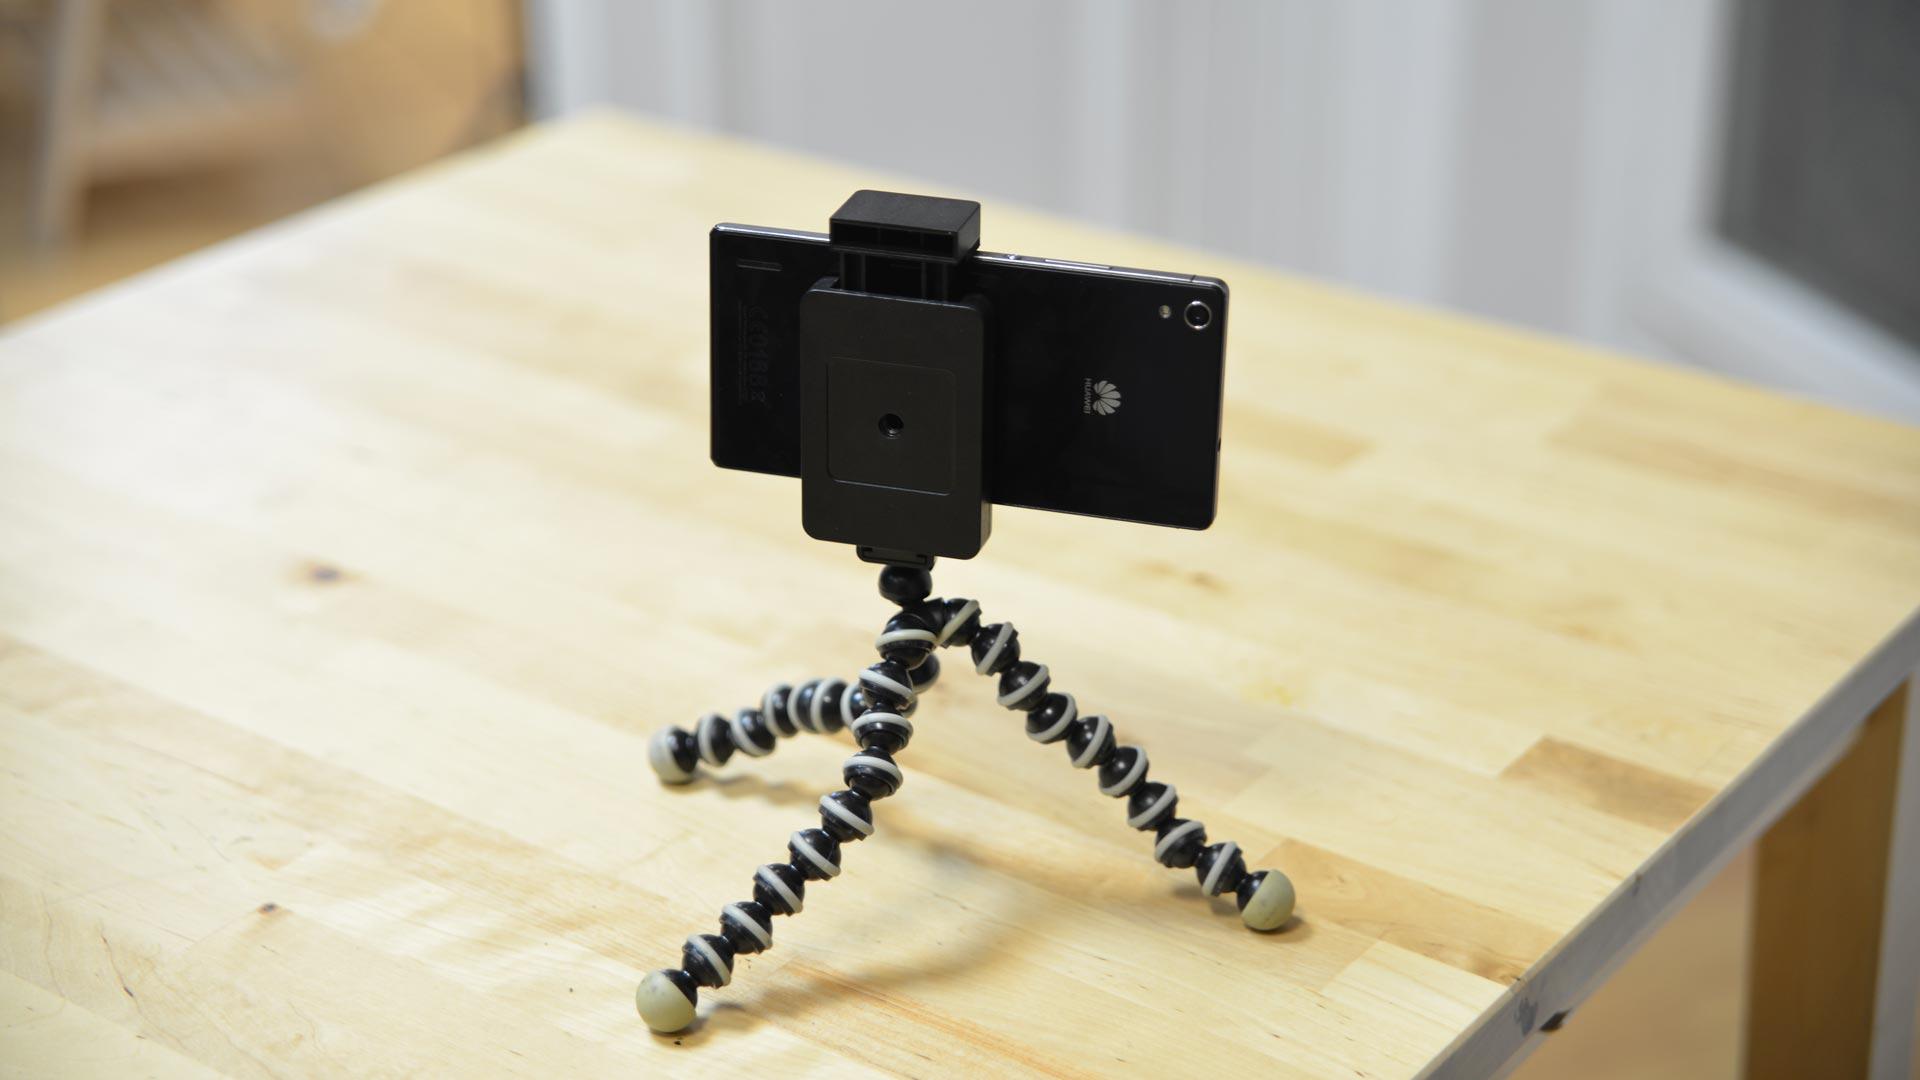 transformez un vieux smartphone en cam ra de s curit tech numerama. Black Bedroom Furniture Sets. Home Design Ideas